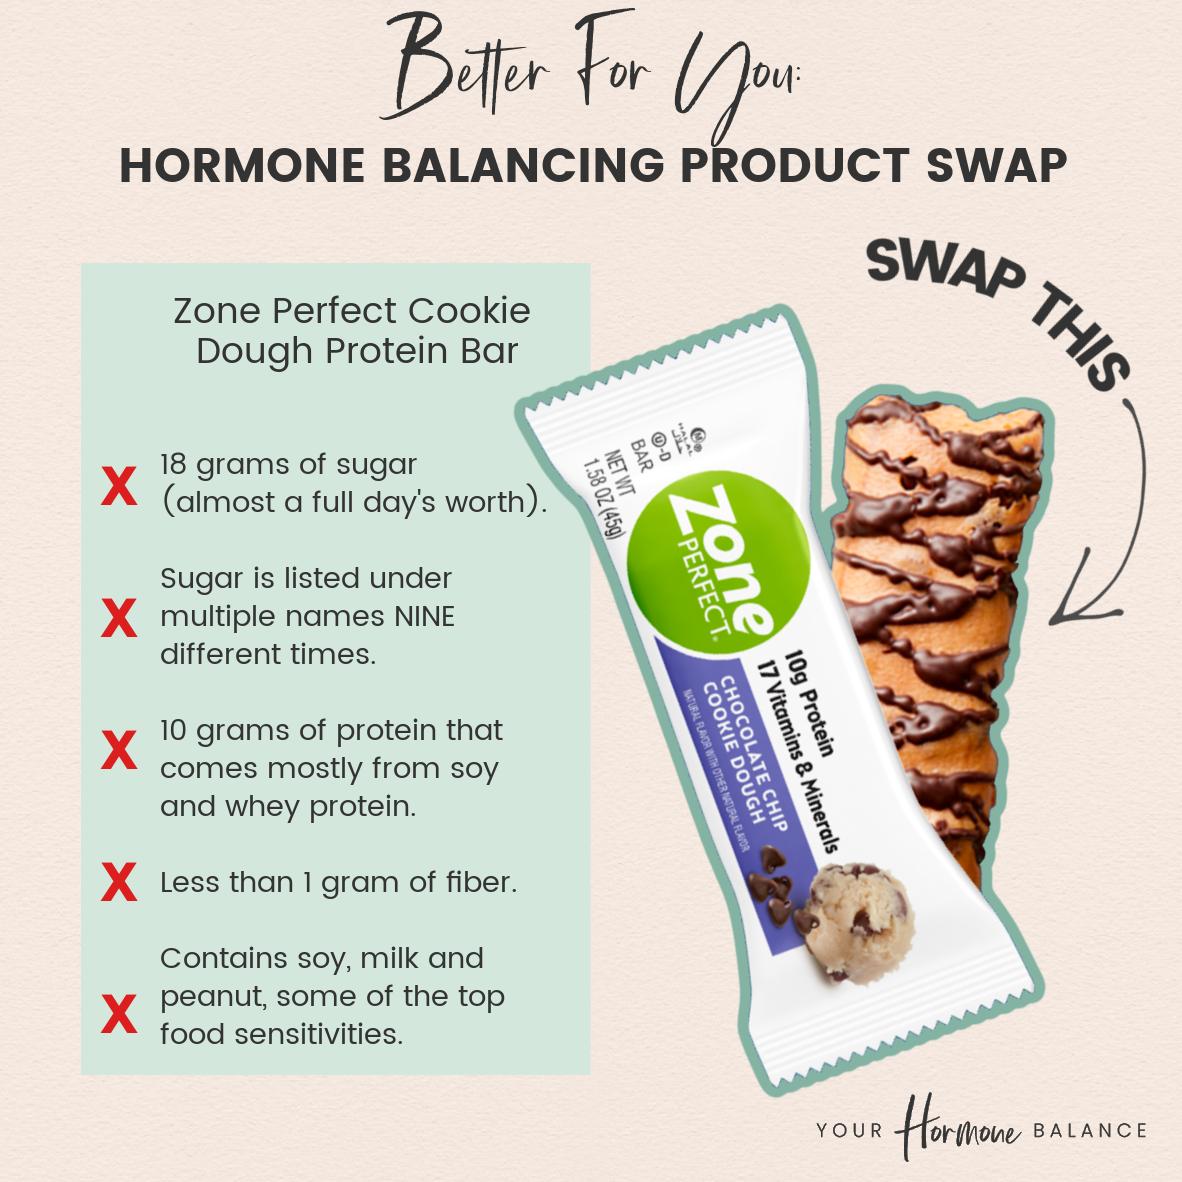 Product Swap (BAD)